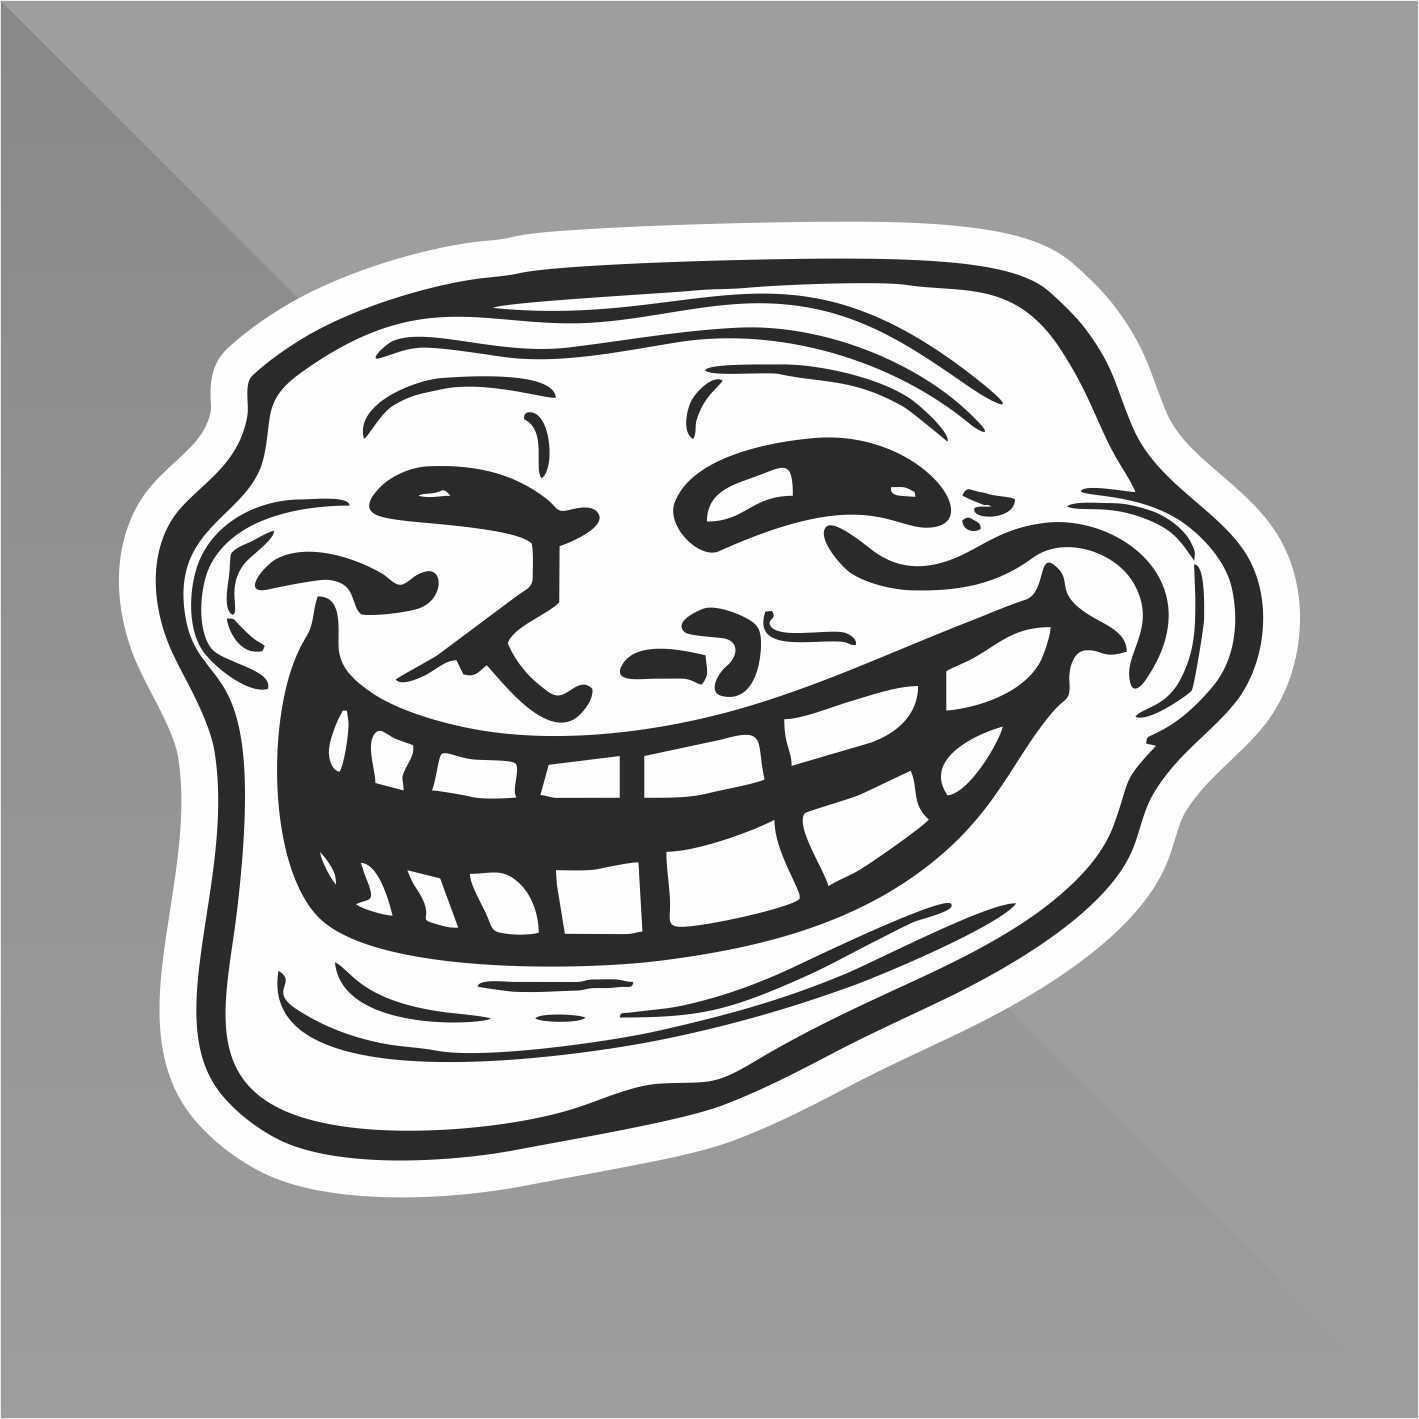 Erreinge sticker troll face meme funny decal auto moto casco wall camper bike adesivo adhesive autocollant pegatina aufkleber cm 10 amazon co uk